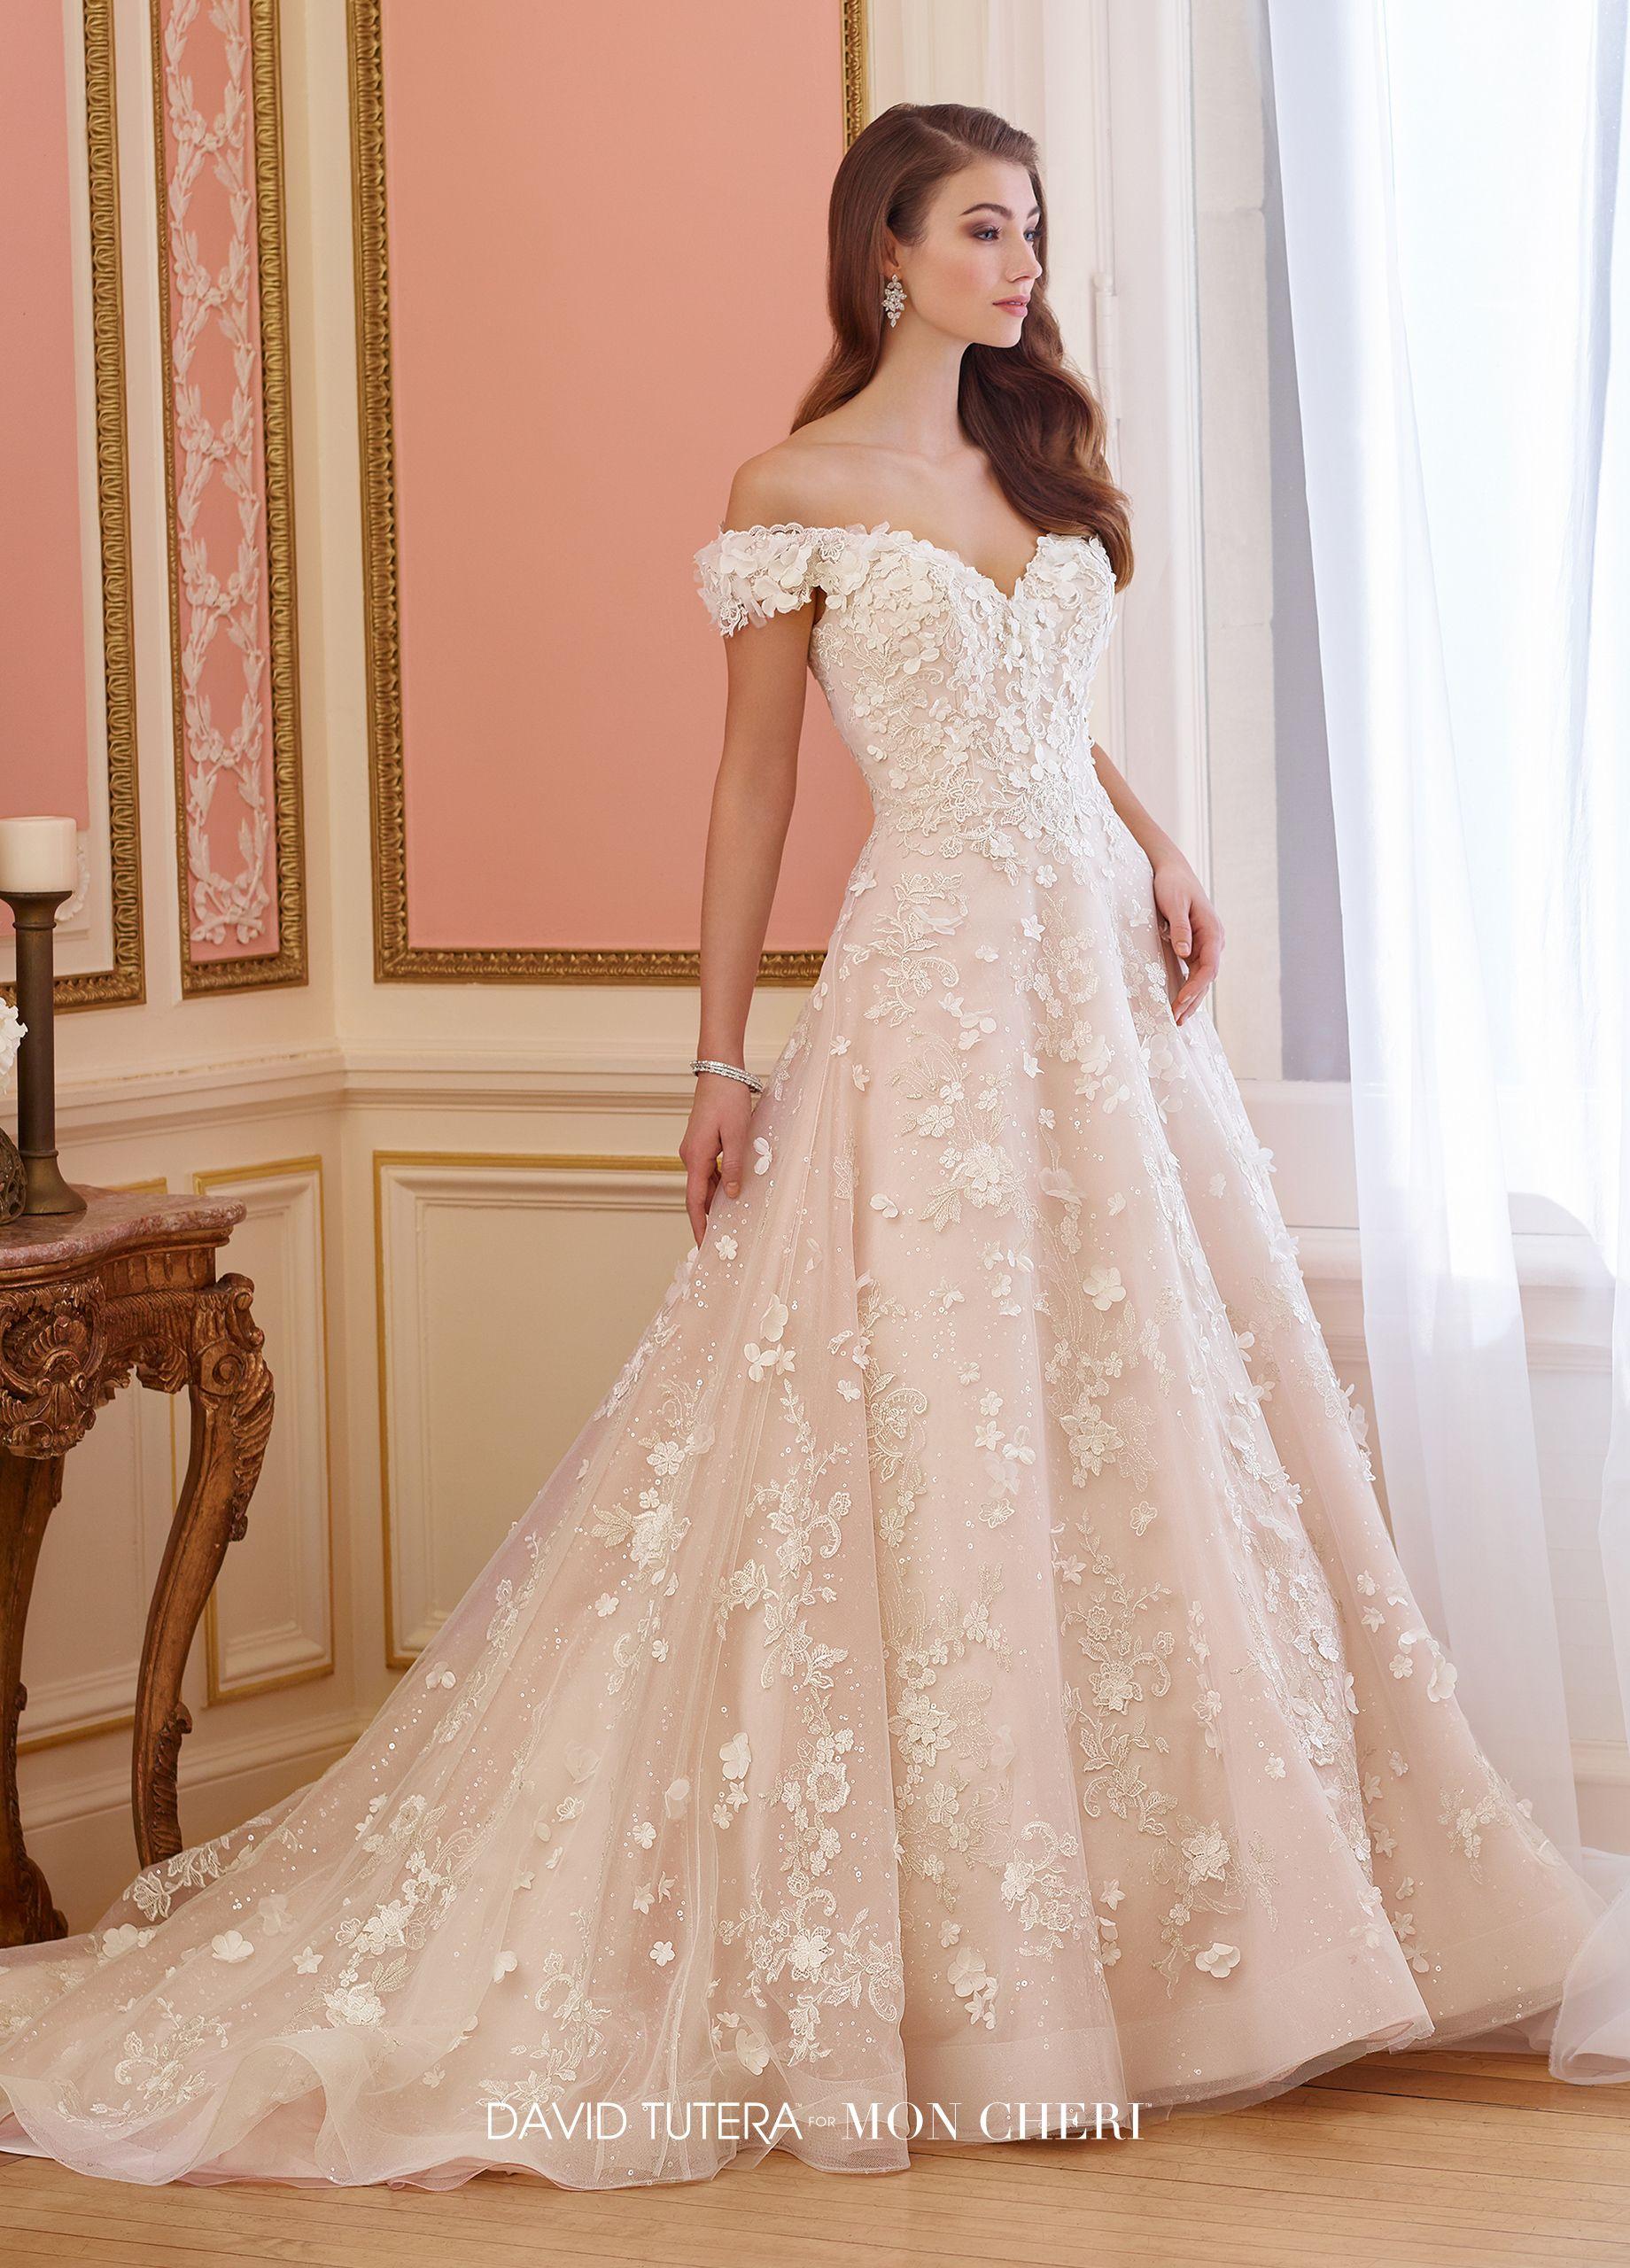 Dipped wedding dress  Lace OffTheShoulder Sweetheart ALine Wedding Dress  Elnora